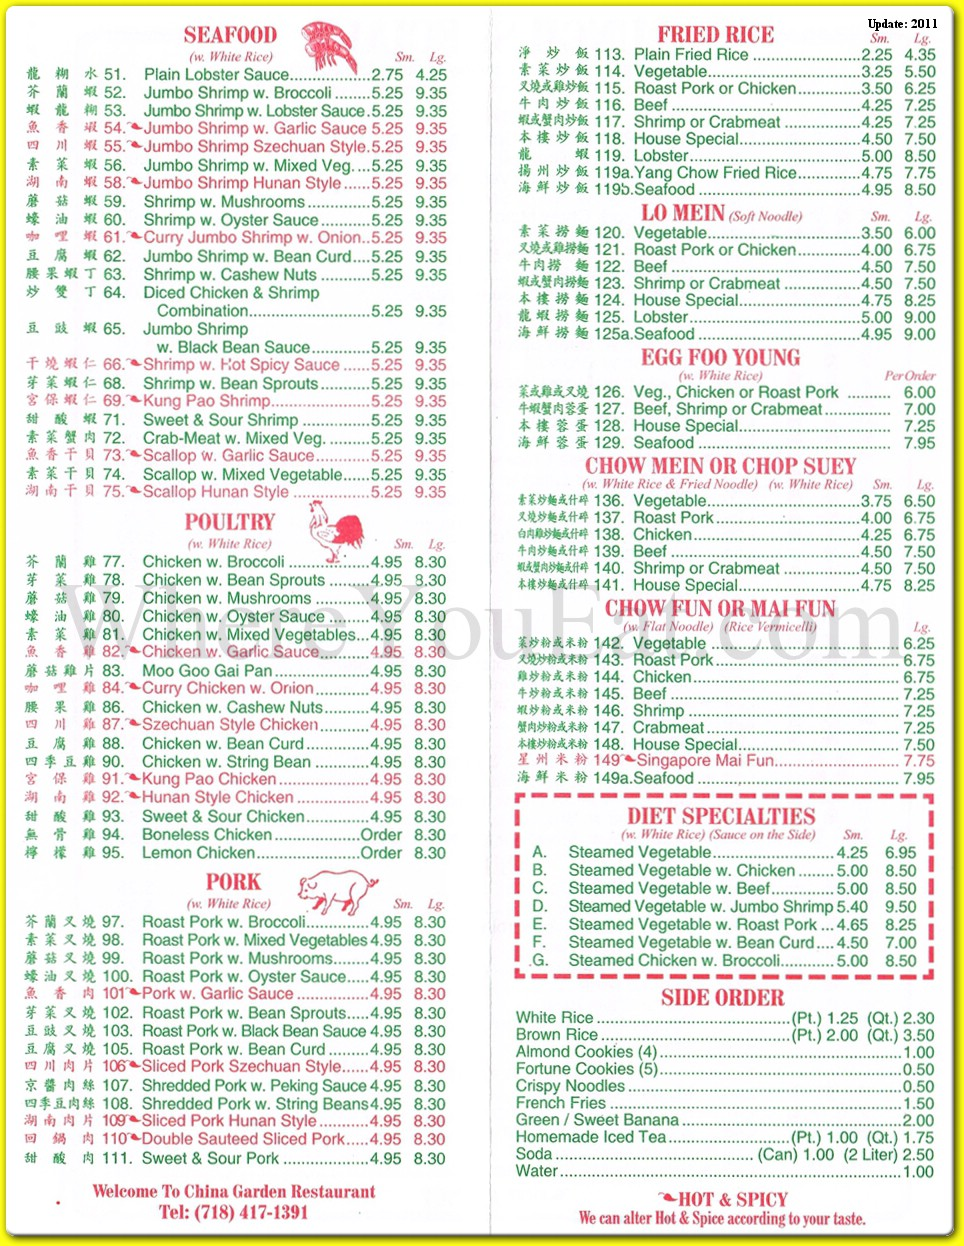 China Garden Restaurant In Queens Official Menus Photos